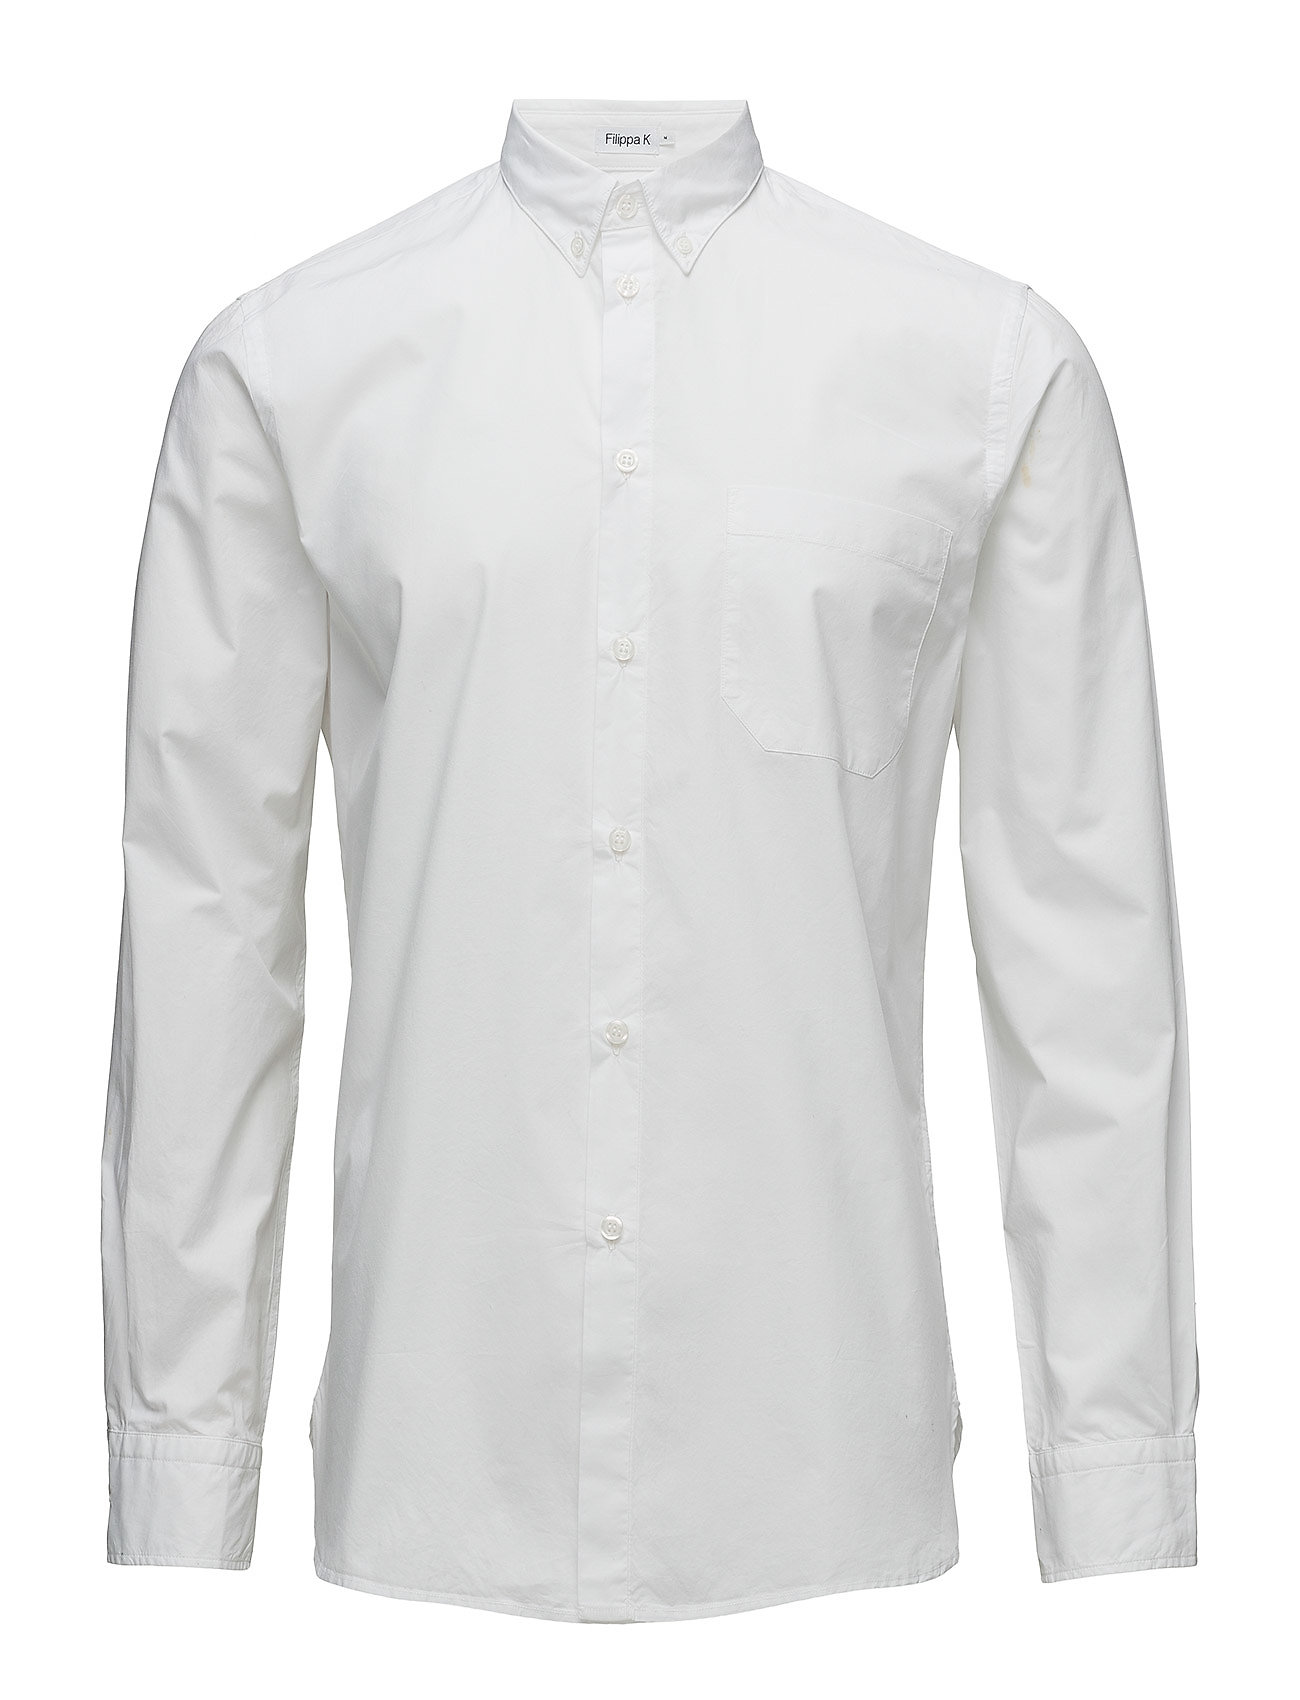 Filippa K M. Peter Washed Poplin Shirt Ögrönlar